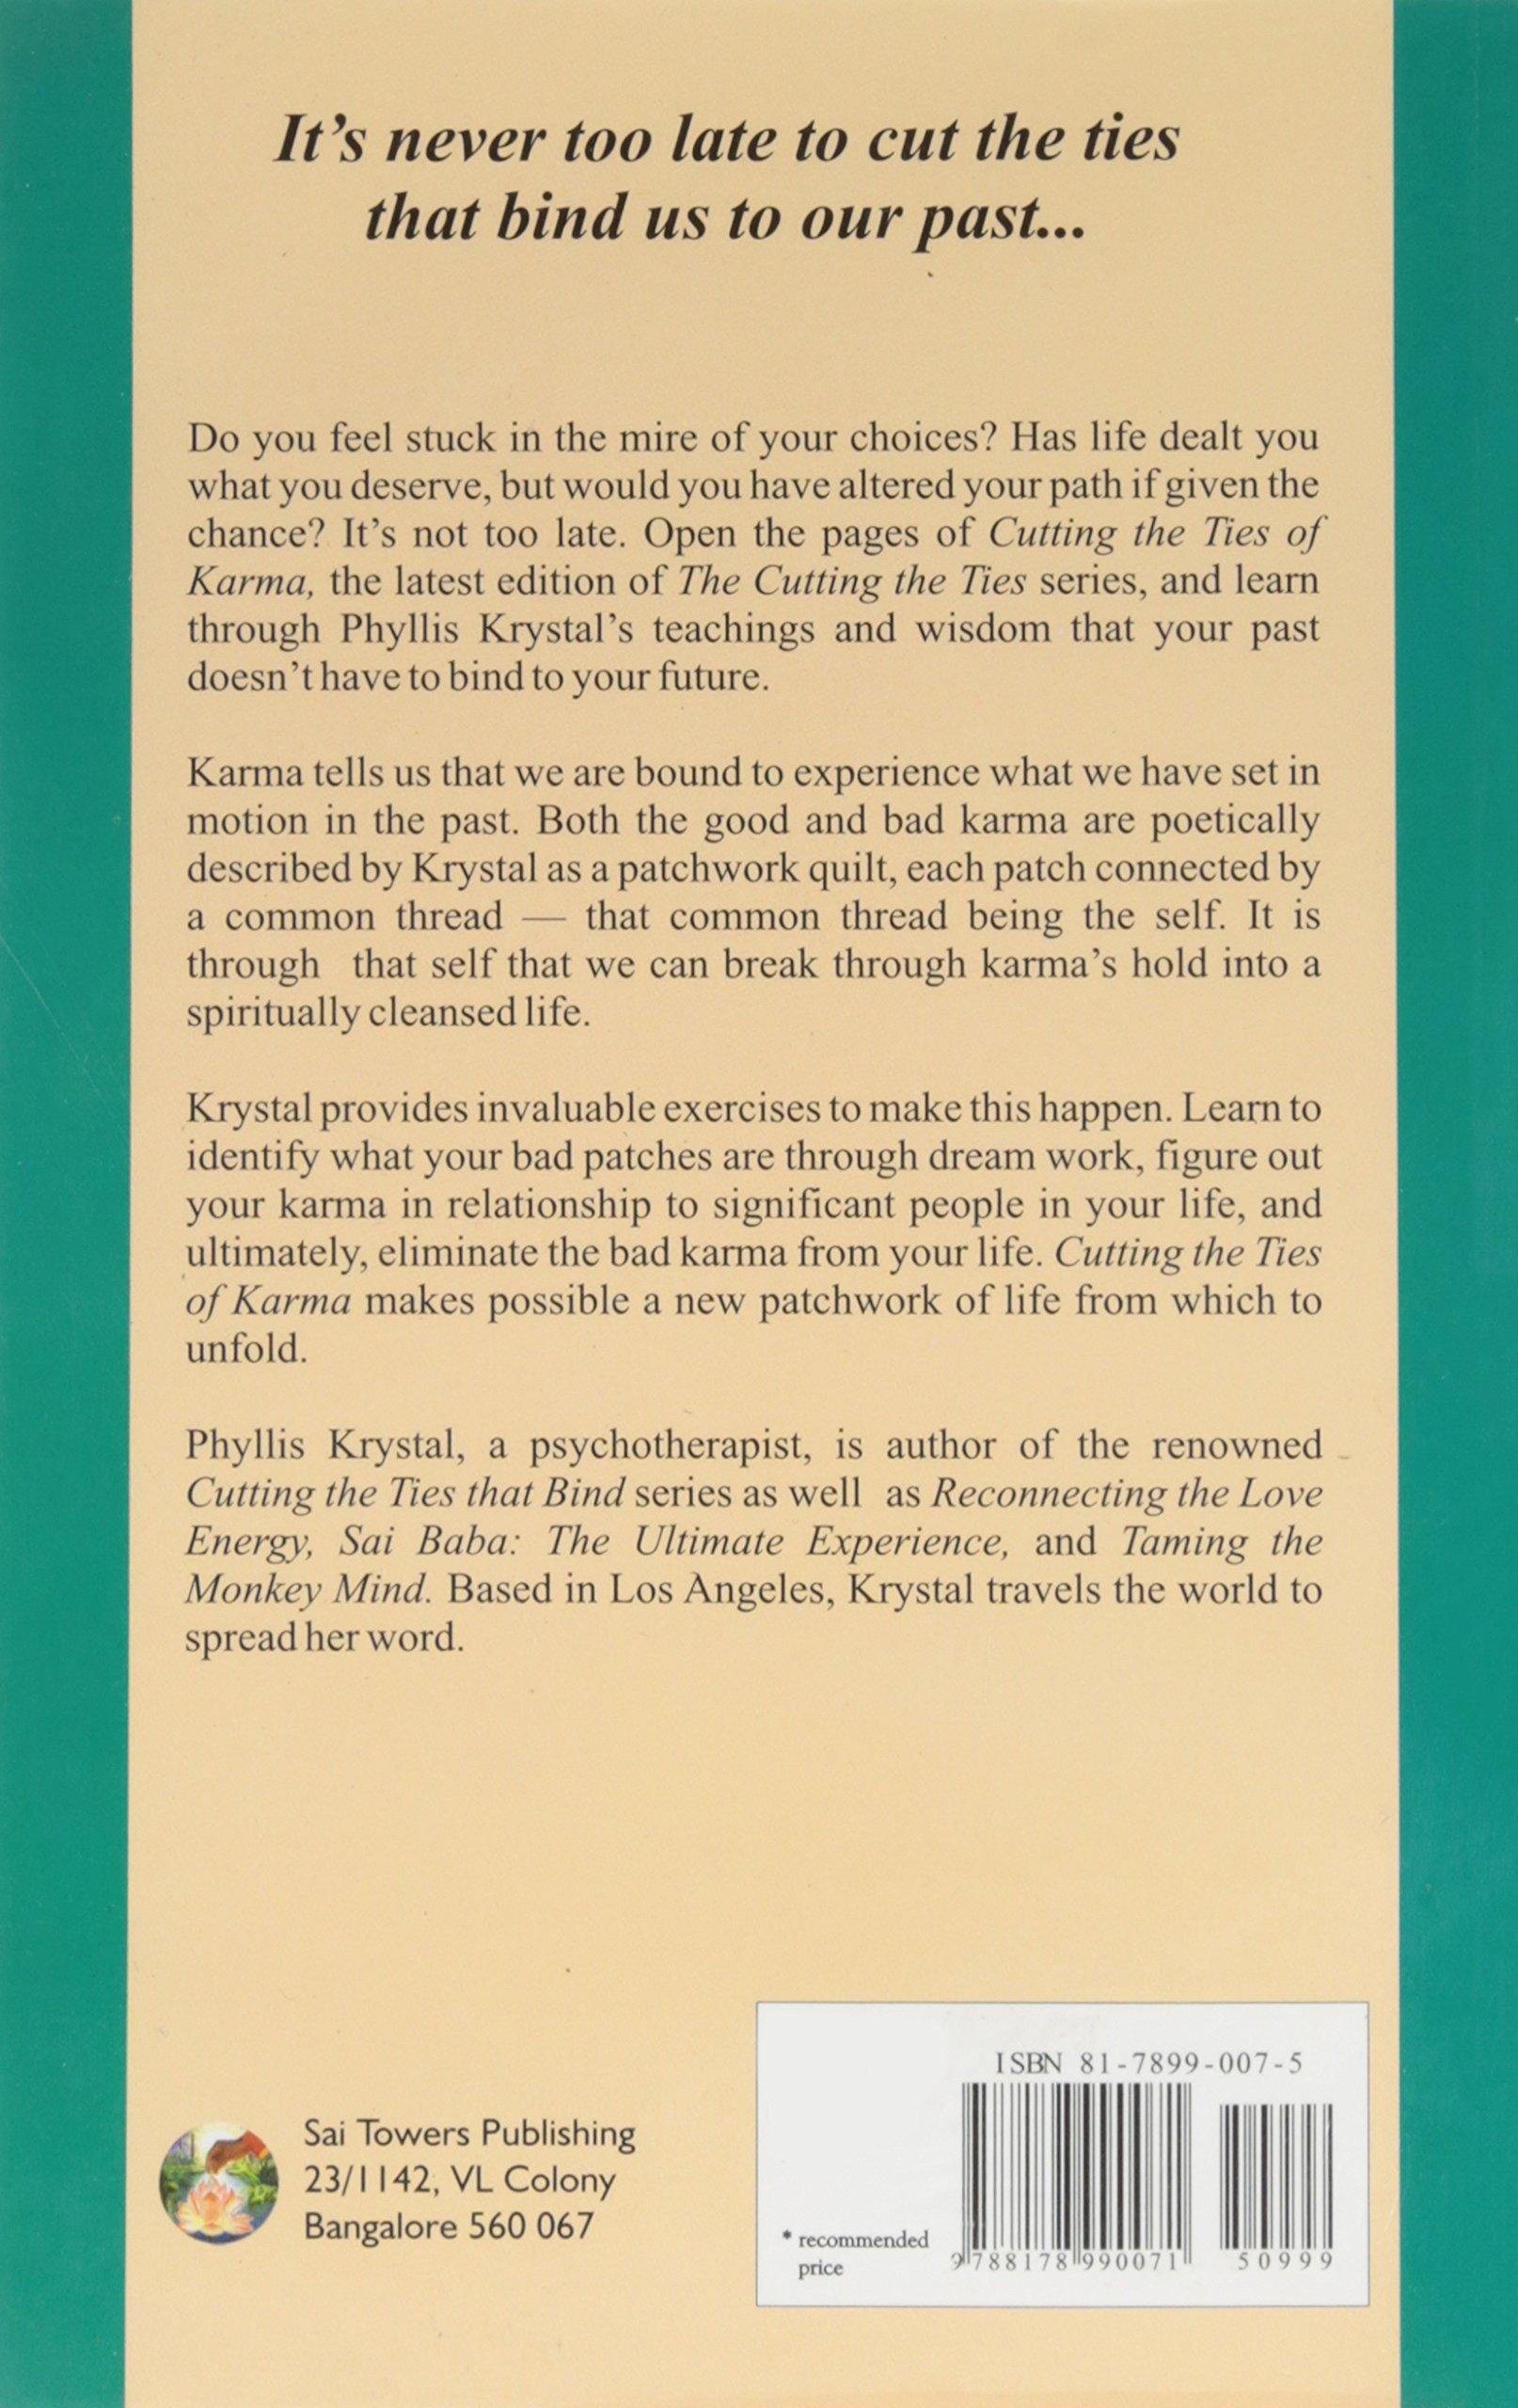 Cutting the ties of karma amazon phyllis krystal books fandeluxe Gallery